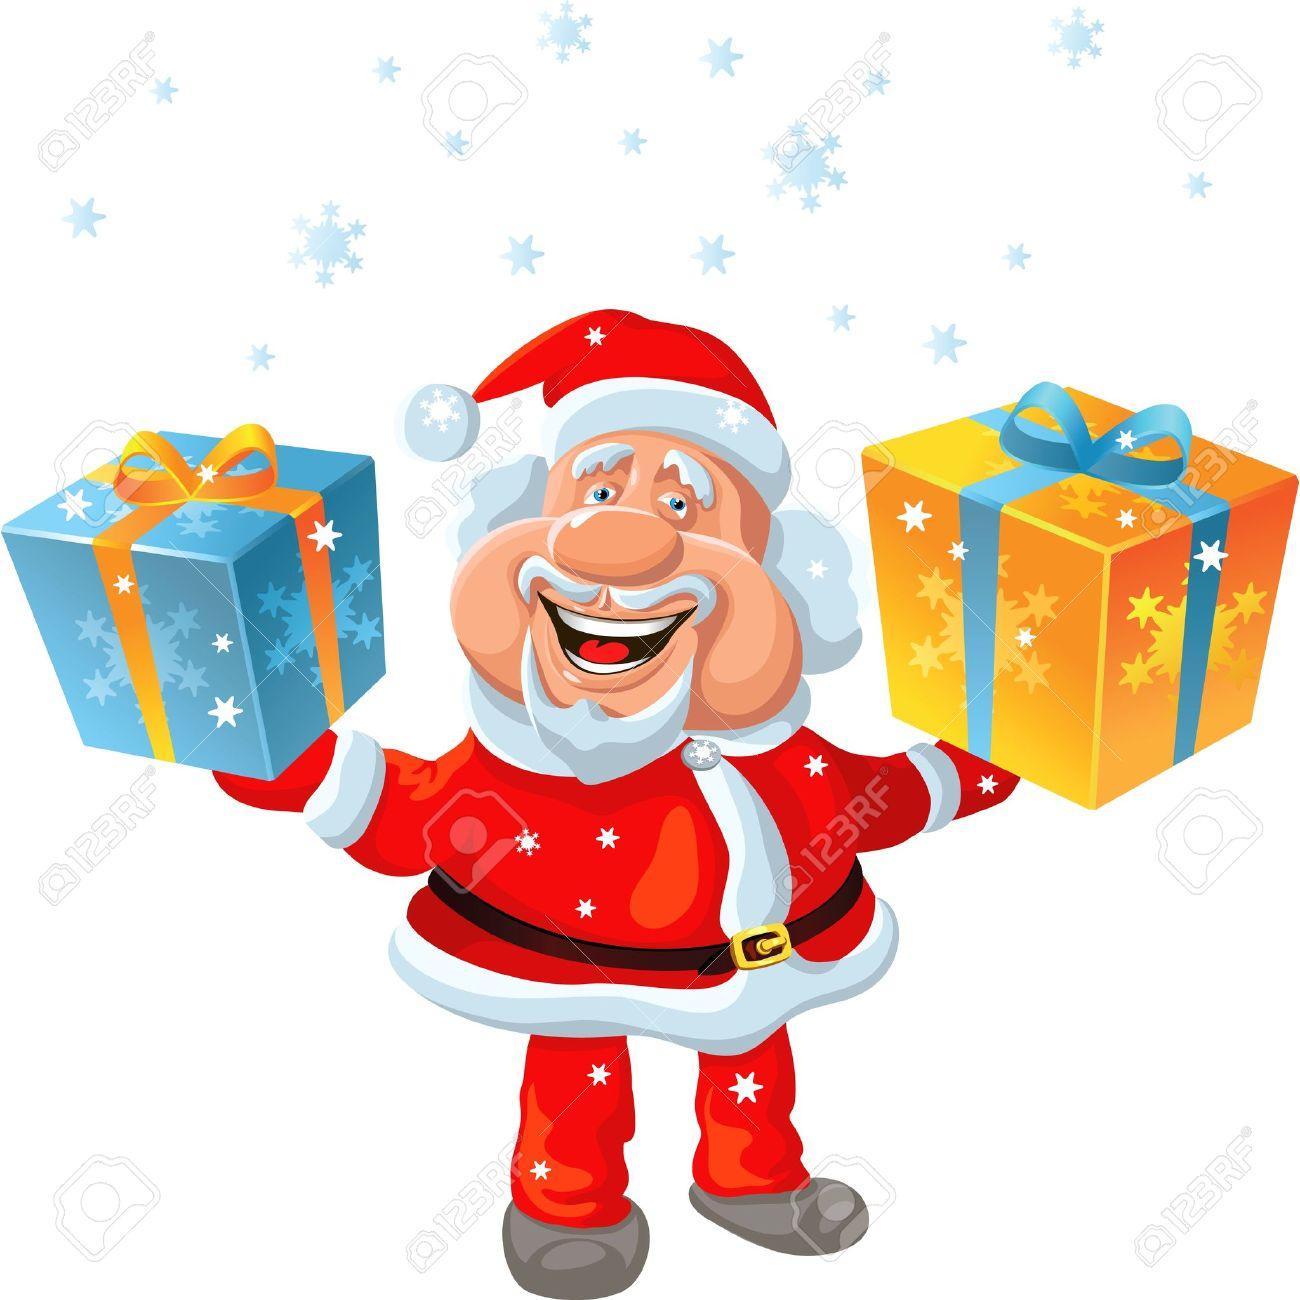 funny cartoon santa claus holding a gift stock vector 11067694 - Santa Claus Gifts